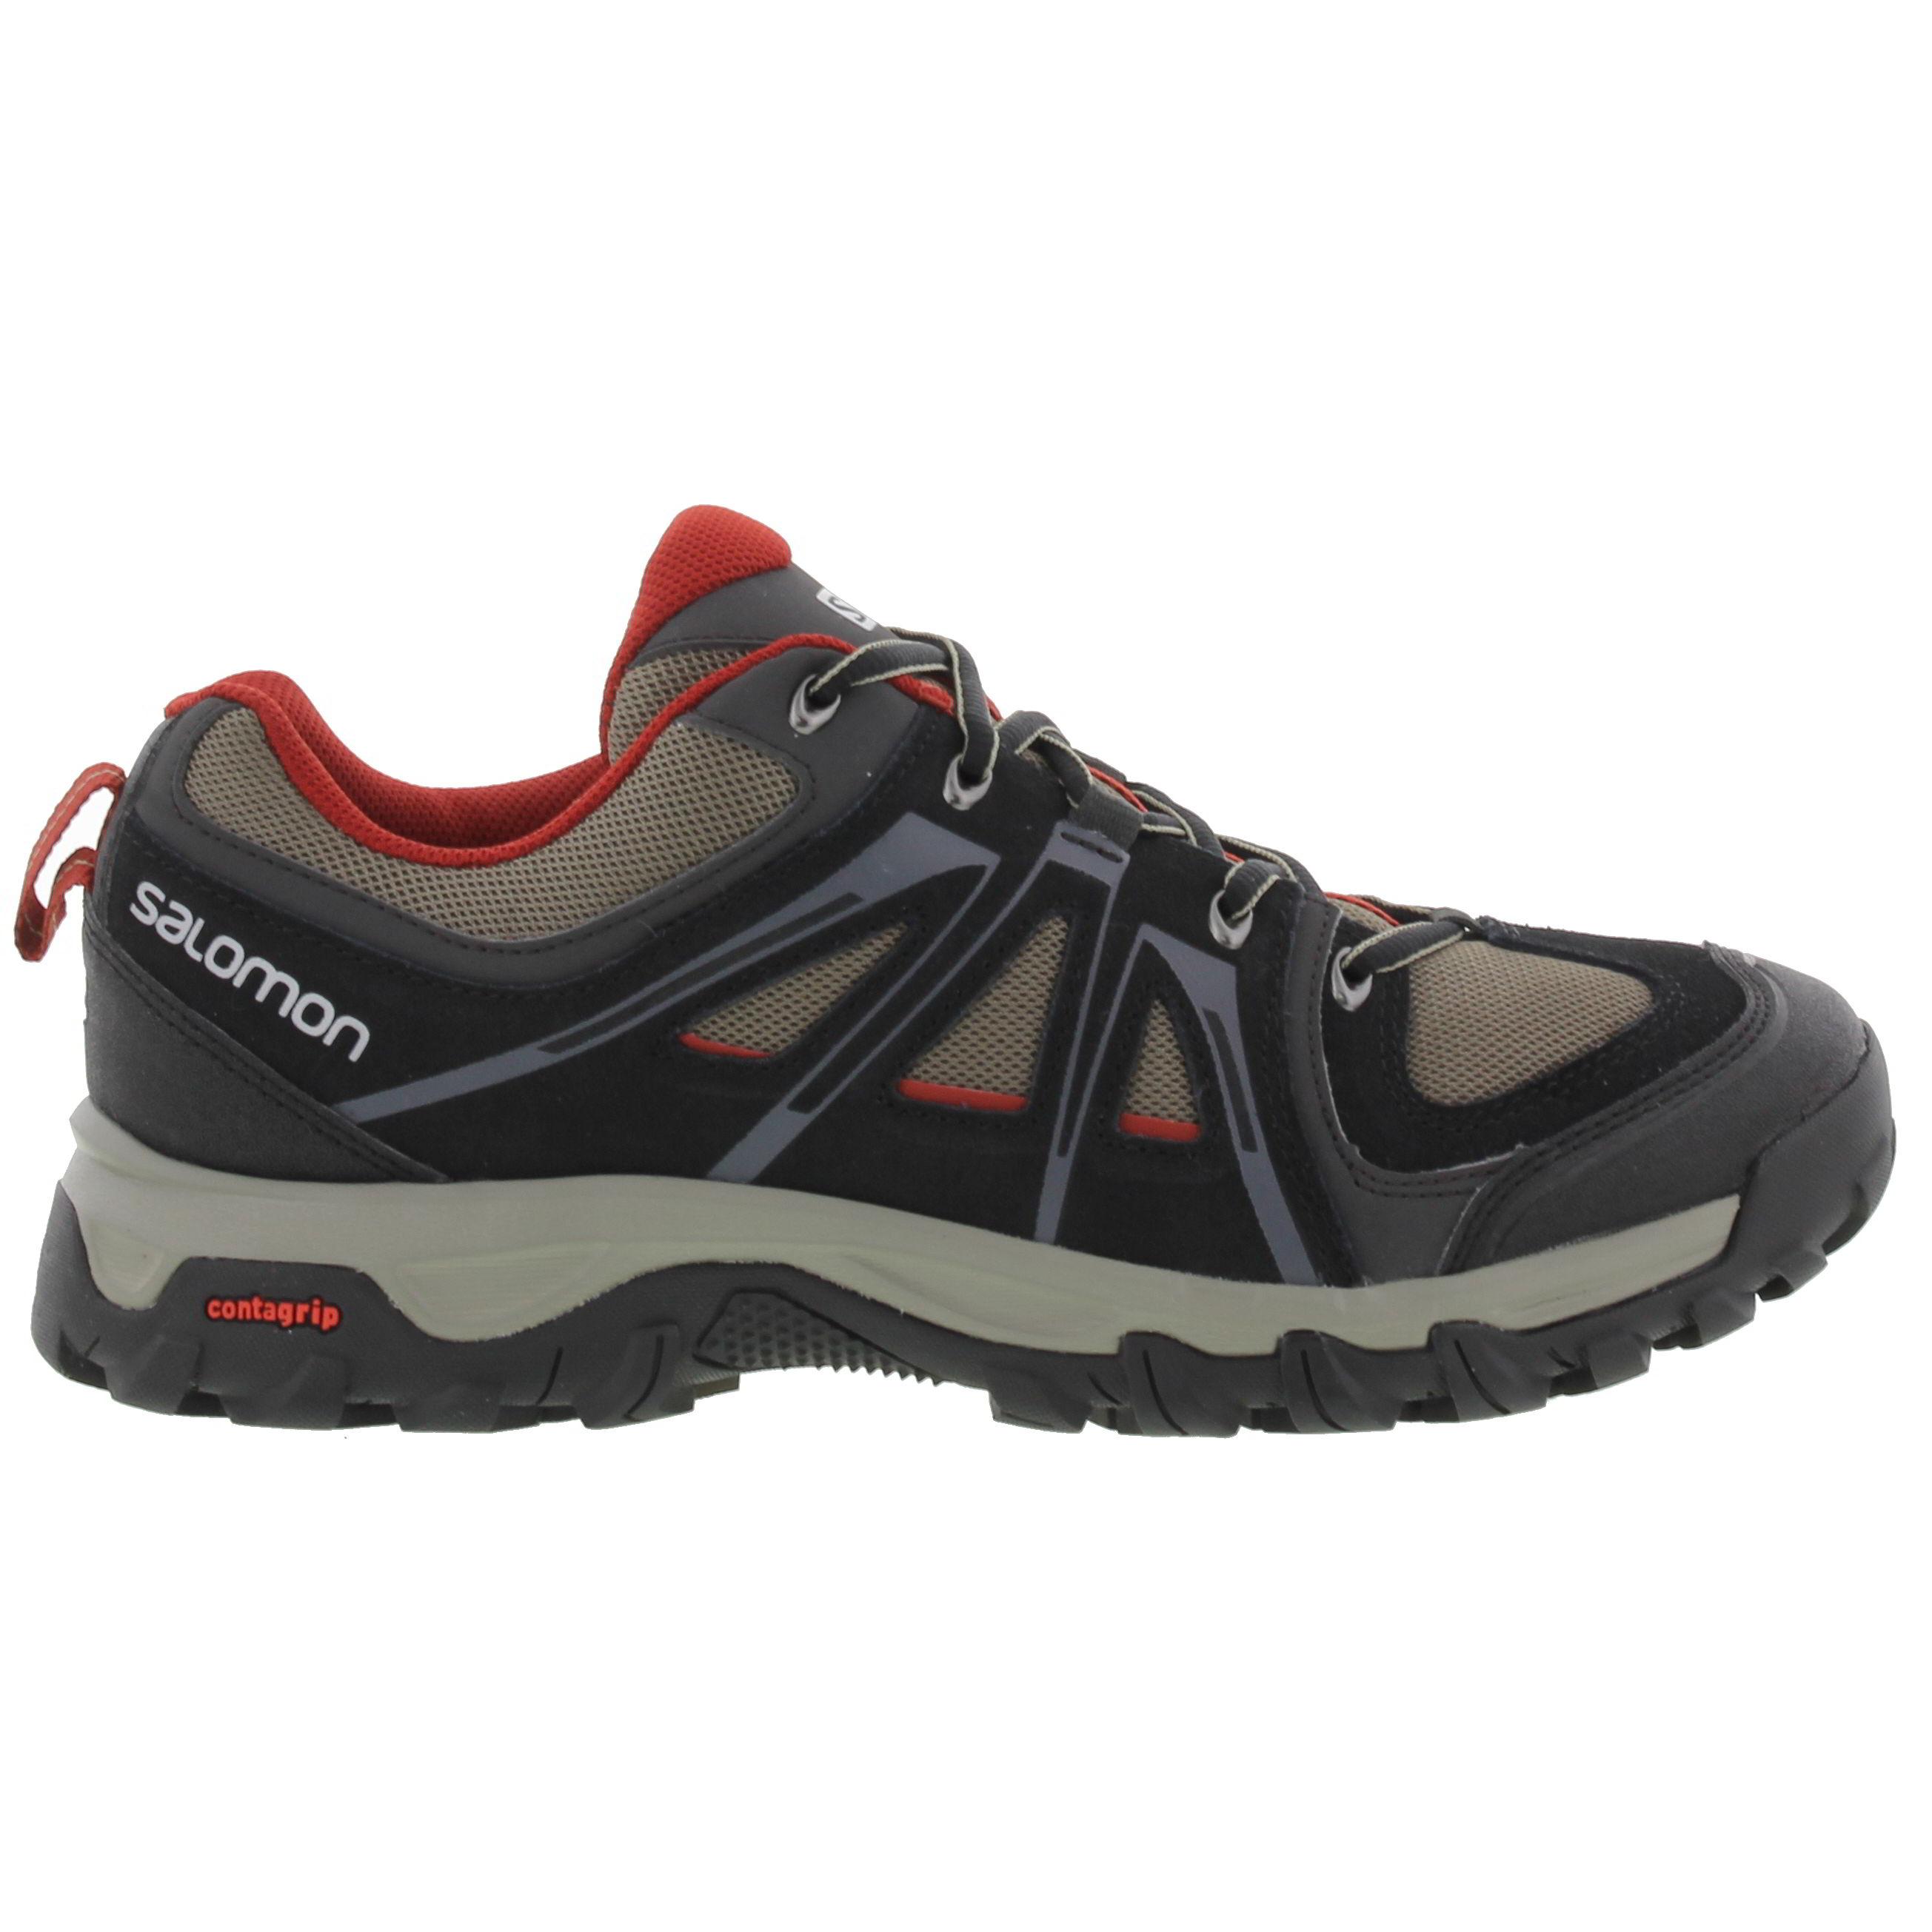 Salomon Evasion  Aero Men S Walking Shoes